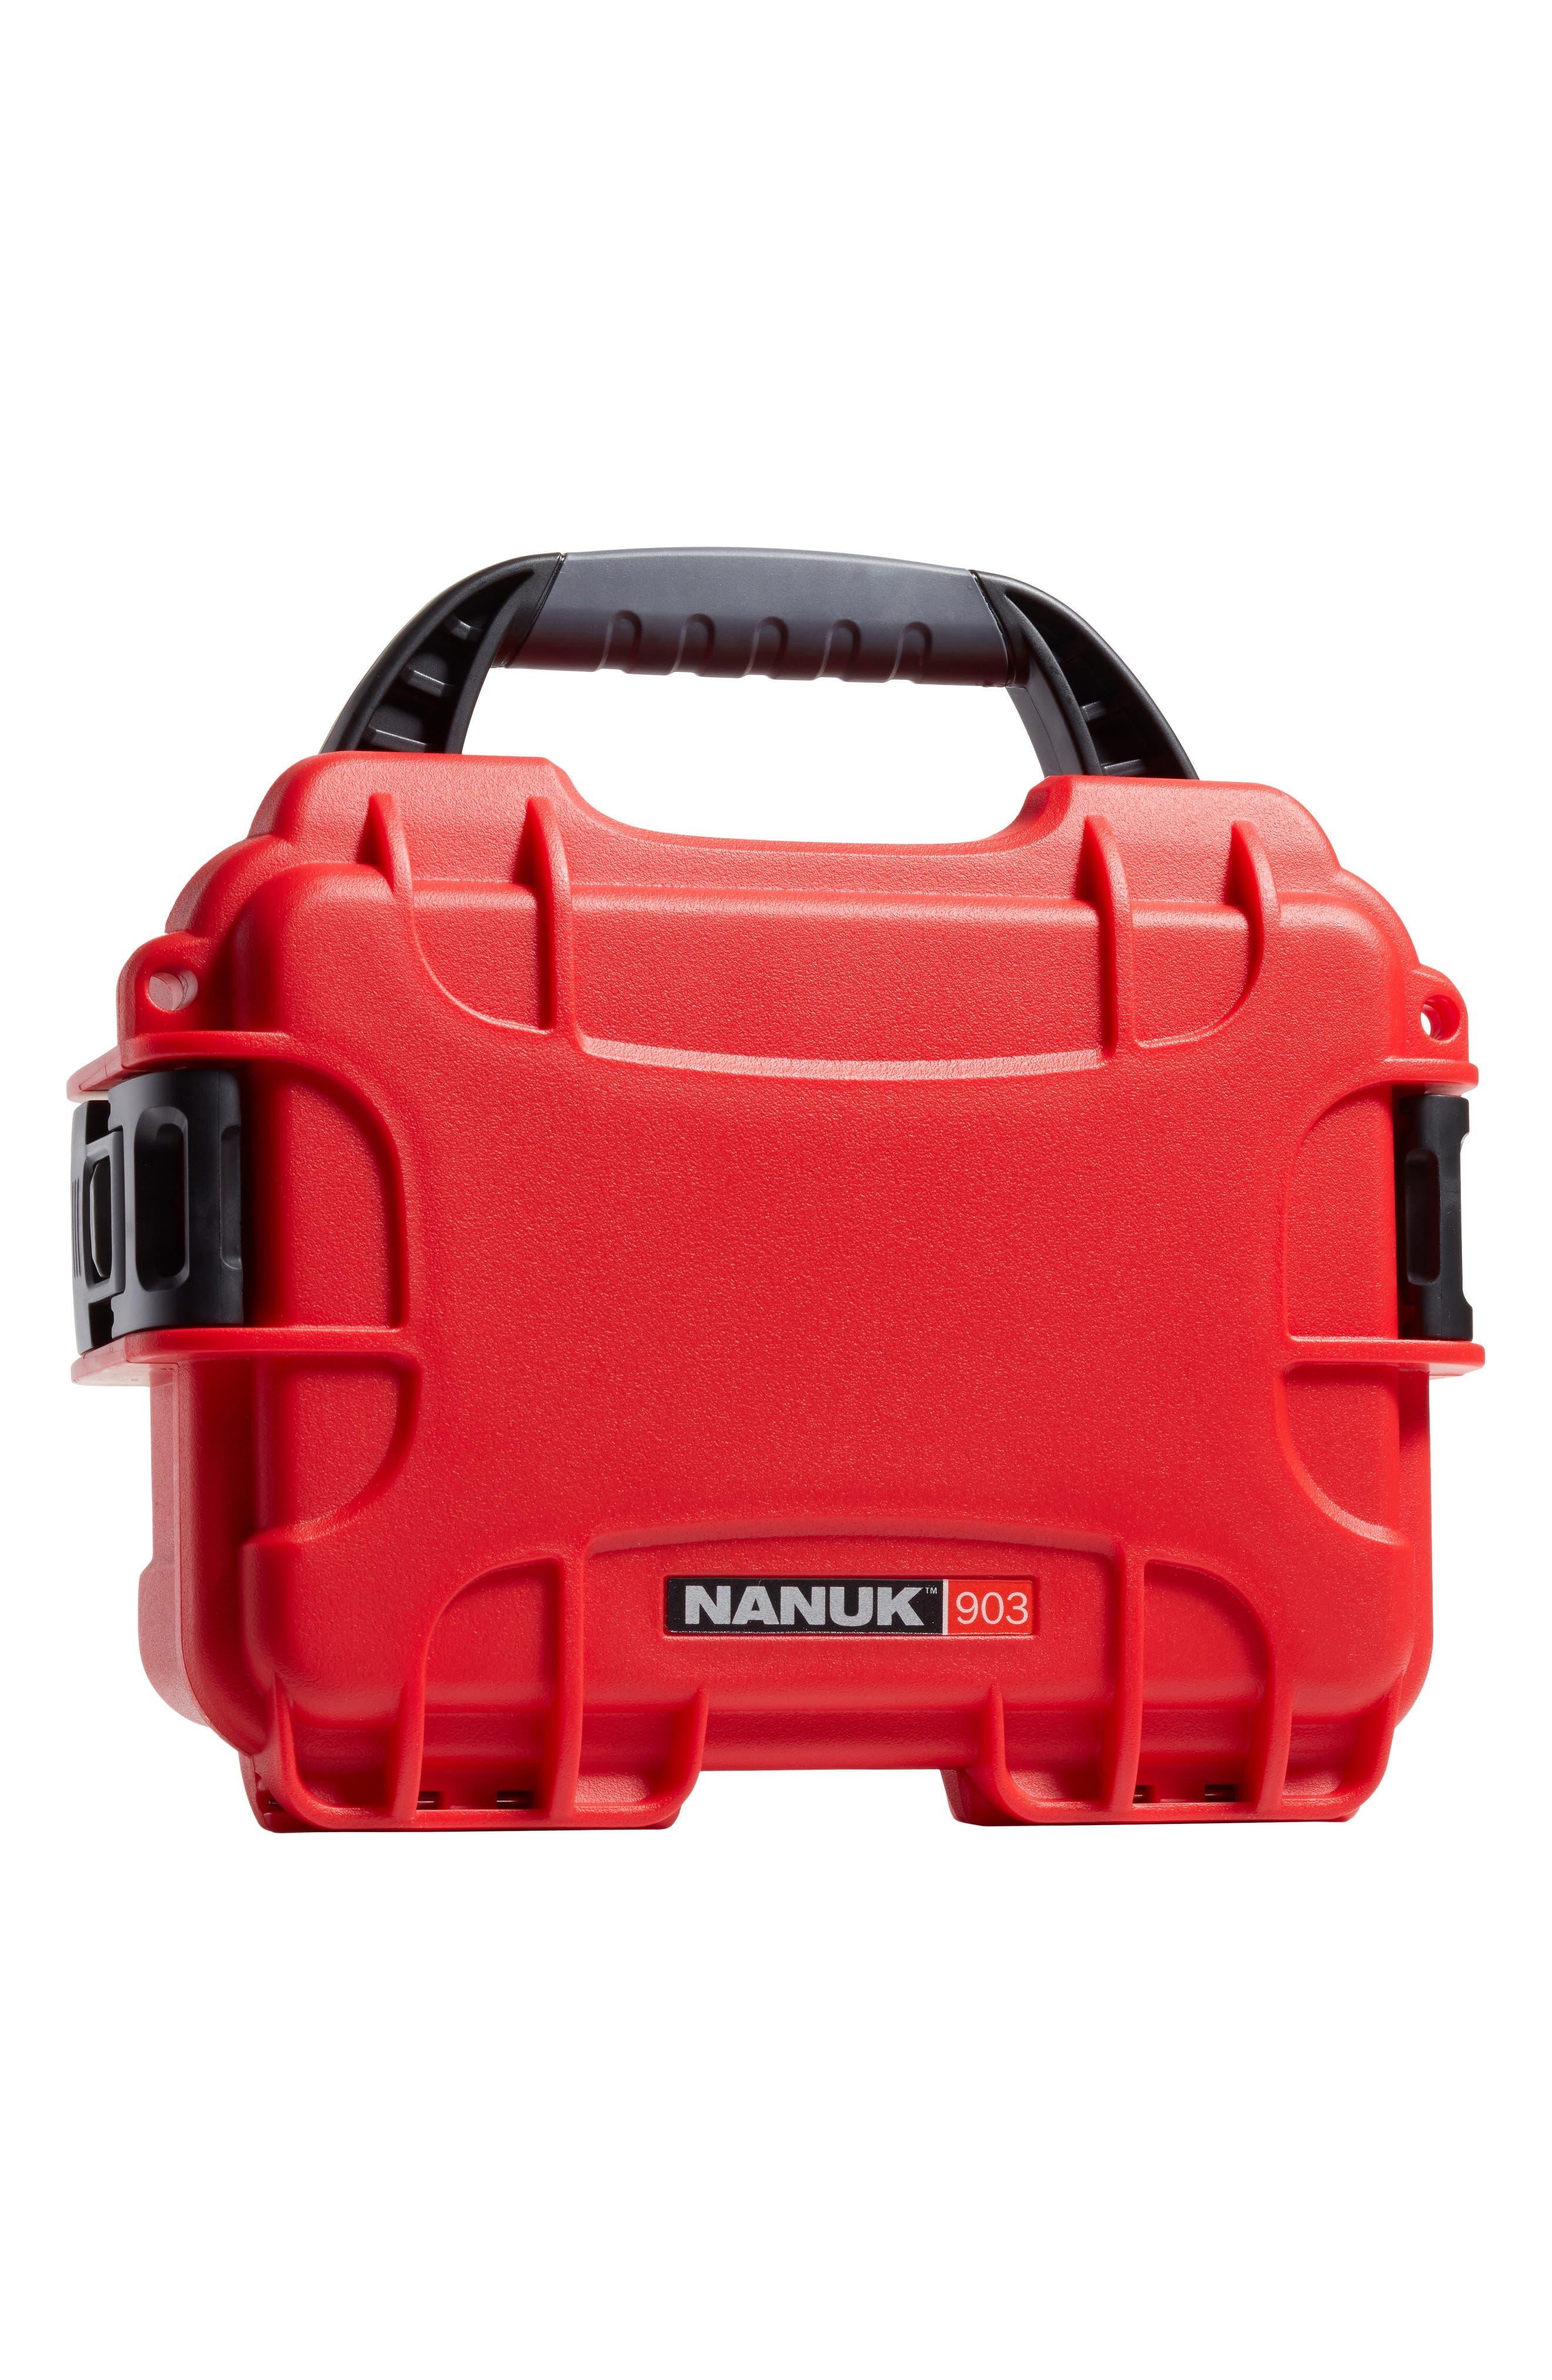 Nanuk 903 Waterproof Hard Case